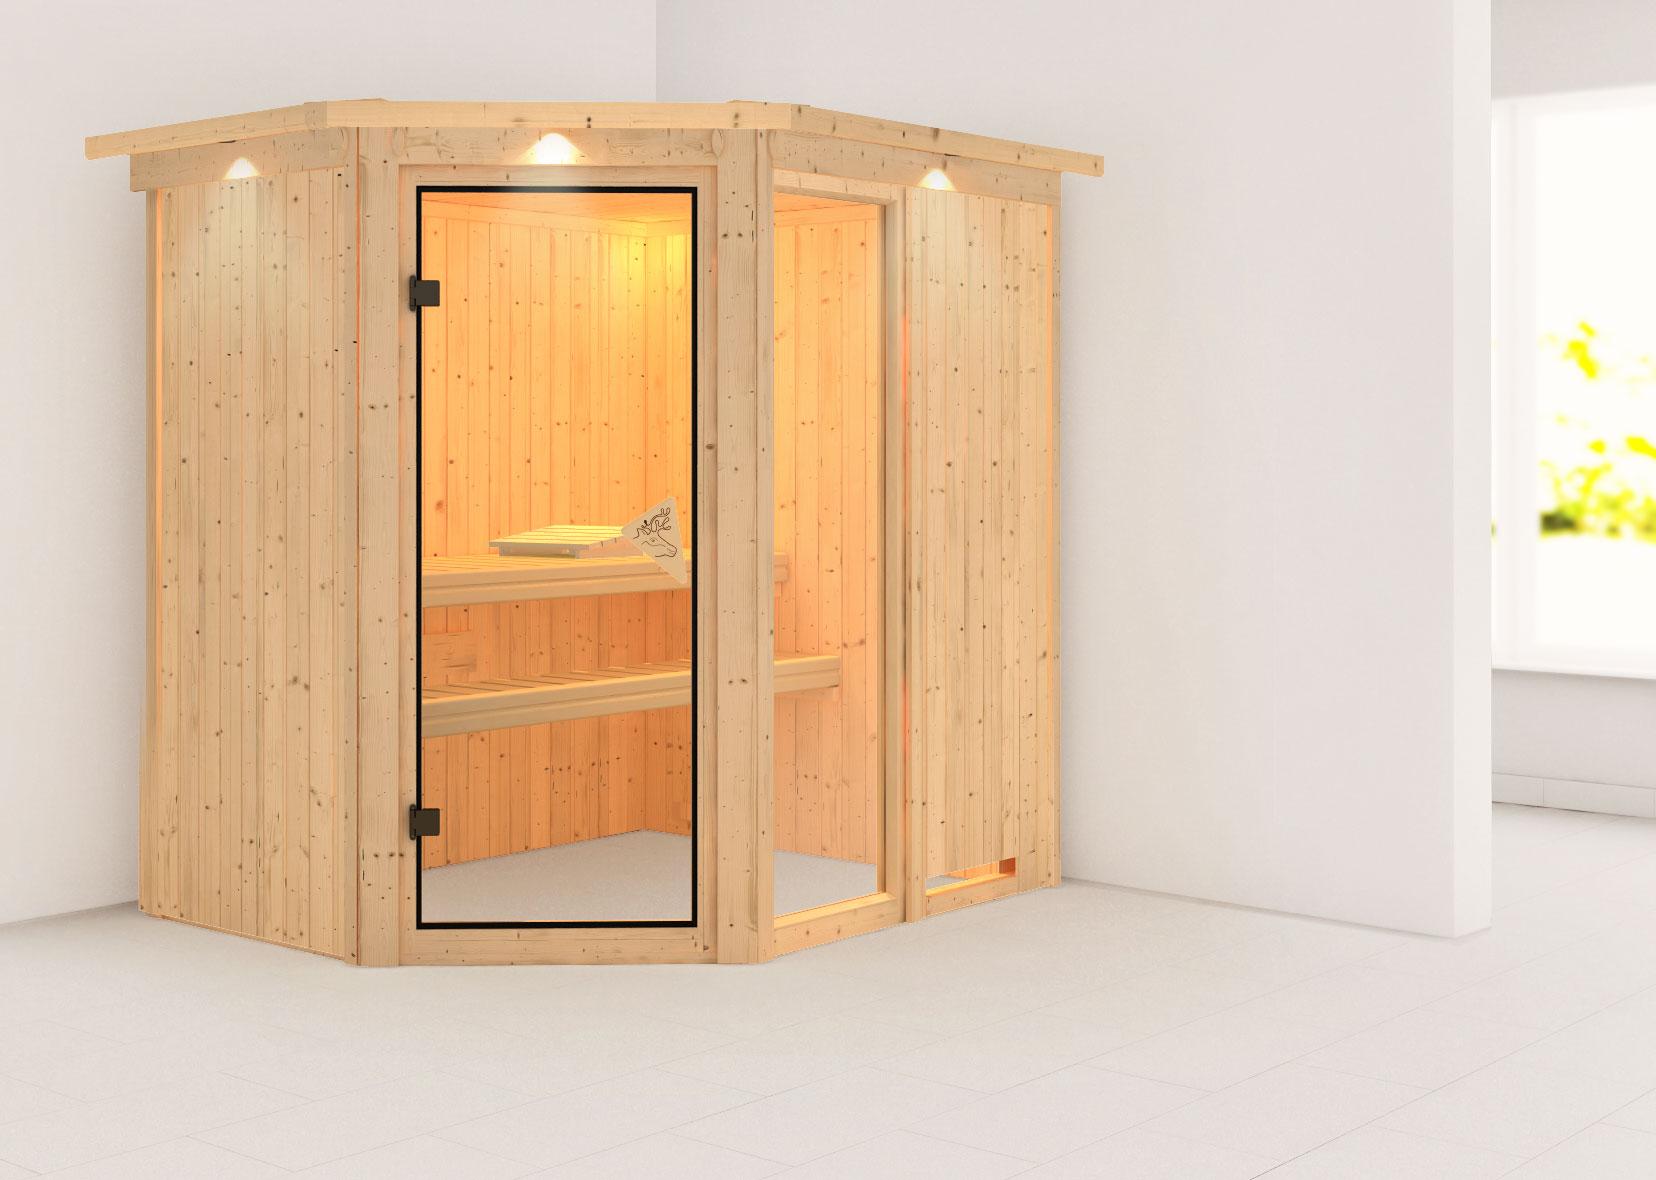 karibu sauna fiona1 68mm dachkranz ohne ofen classic t r